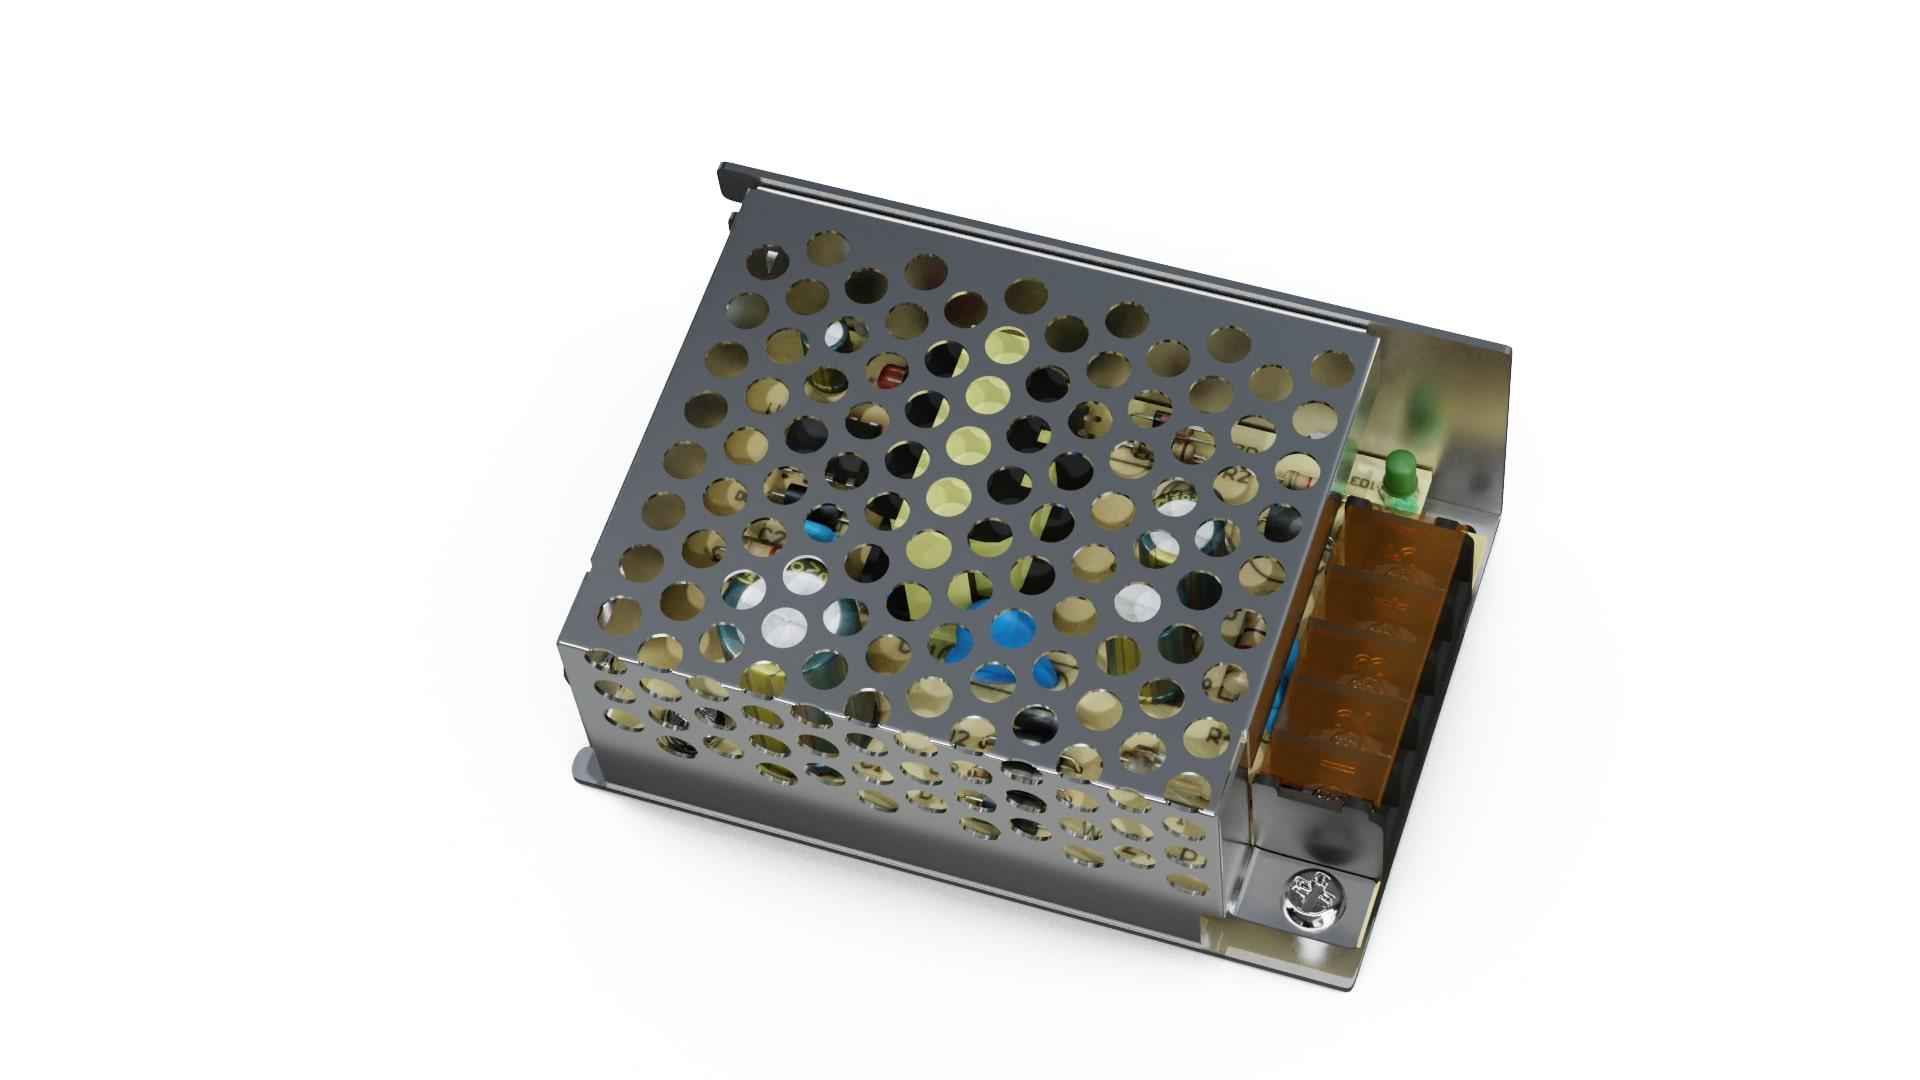 12V 25W IP20 enclosed power supply